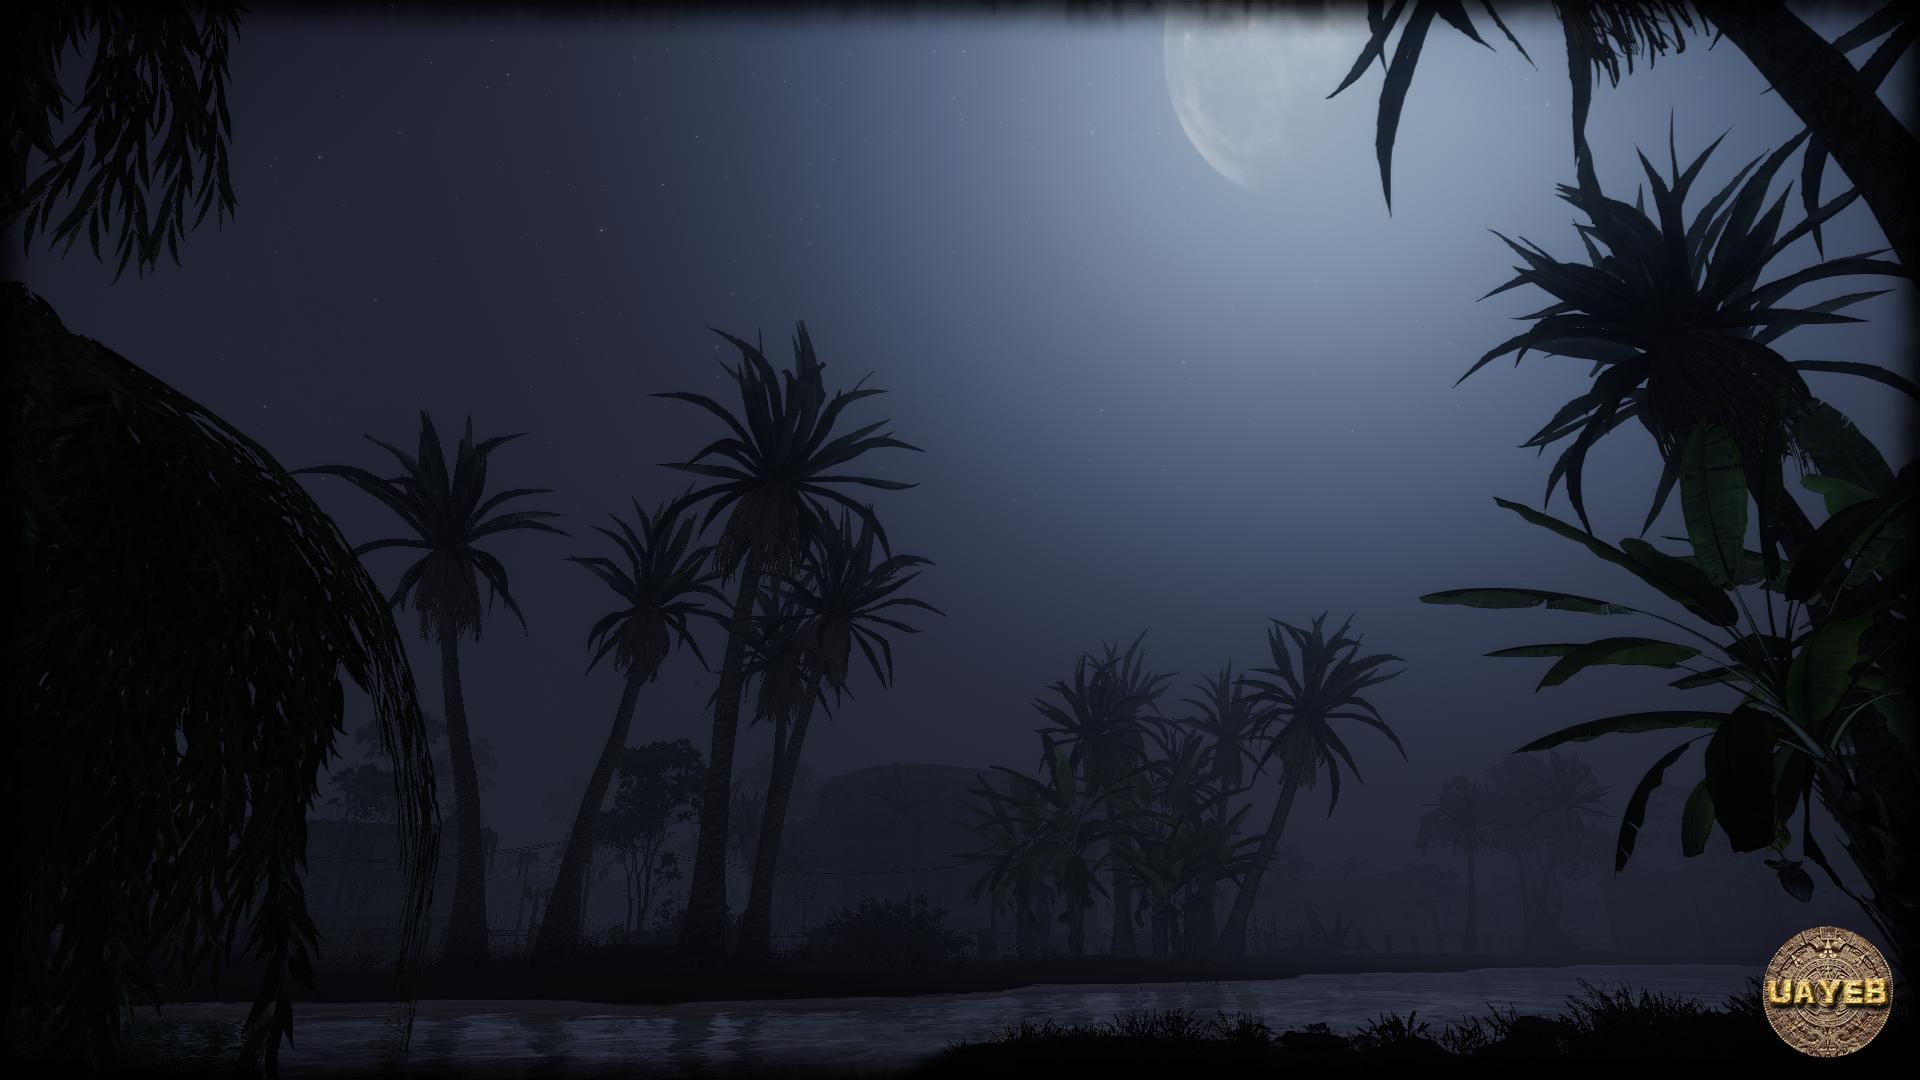 UAYEB: The Dry Land - Episode 1 screenshot